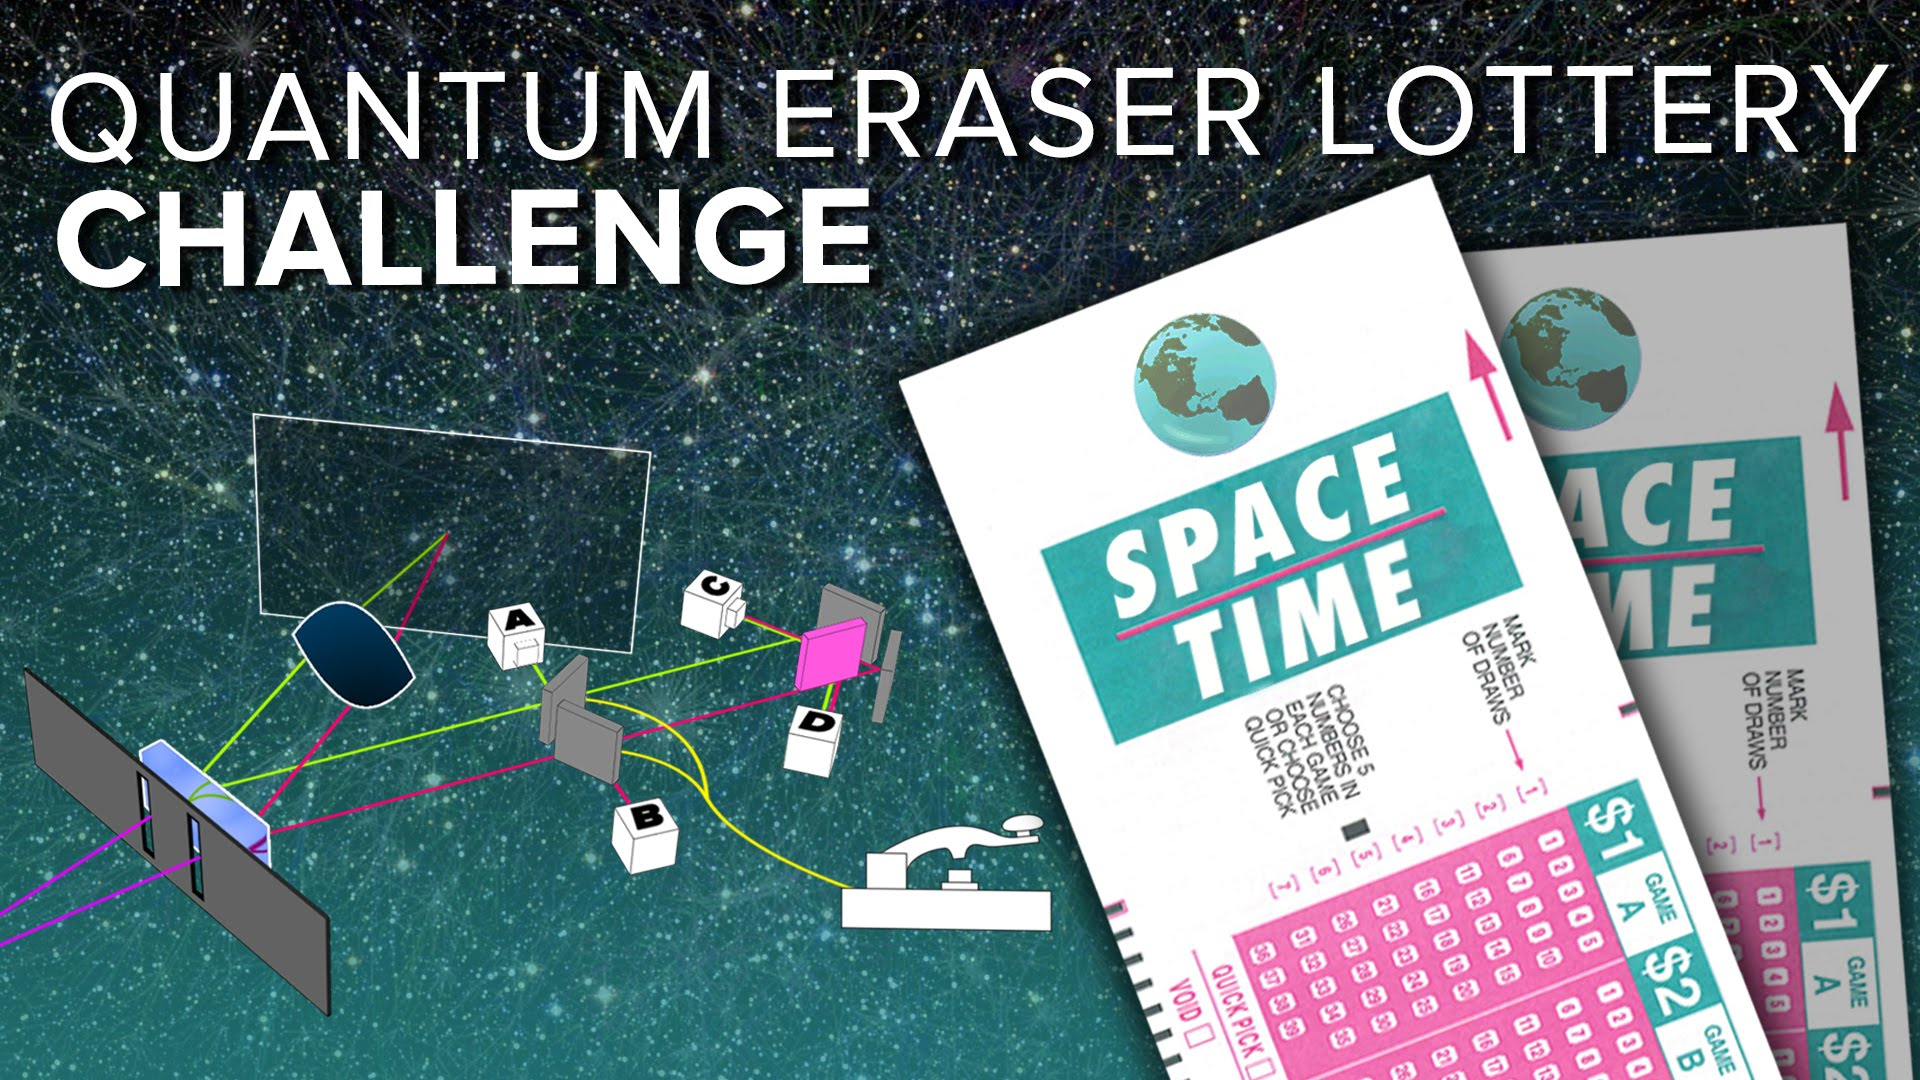 Quantum Eraser Lottery Challenge